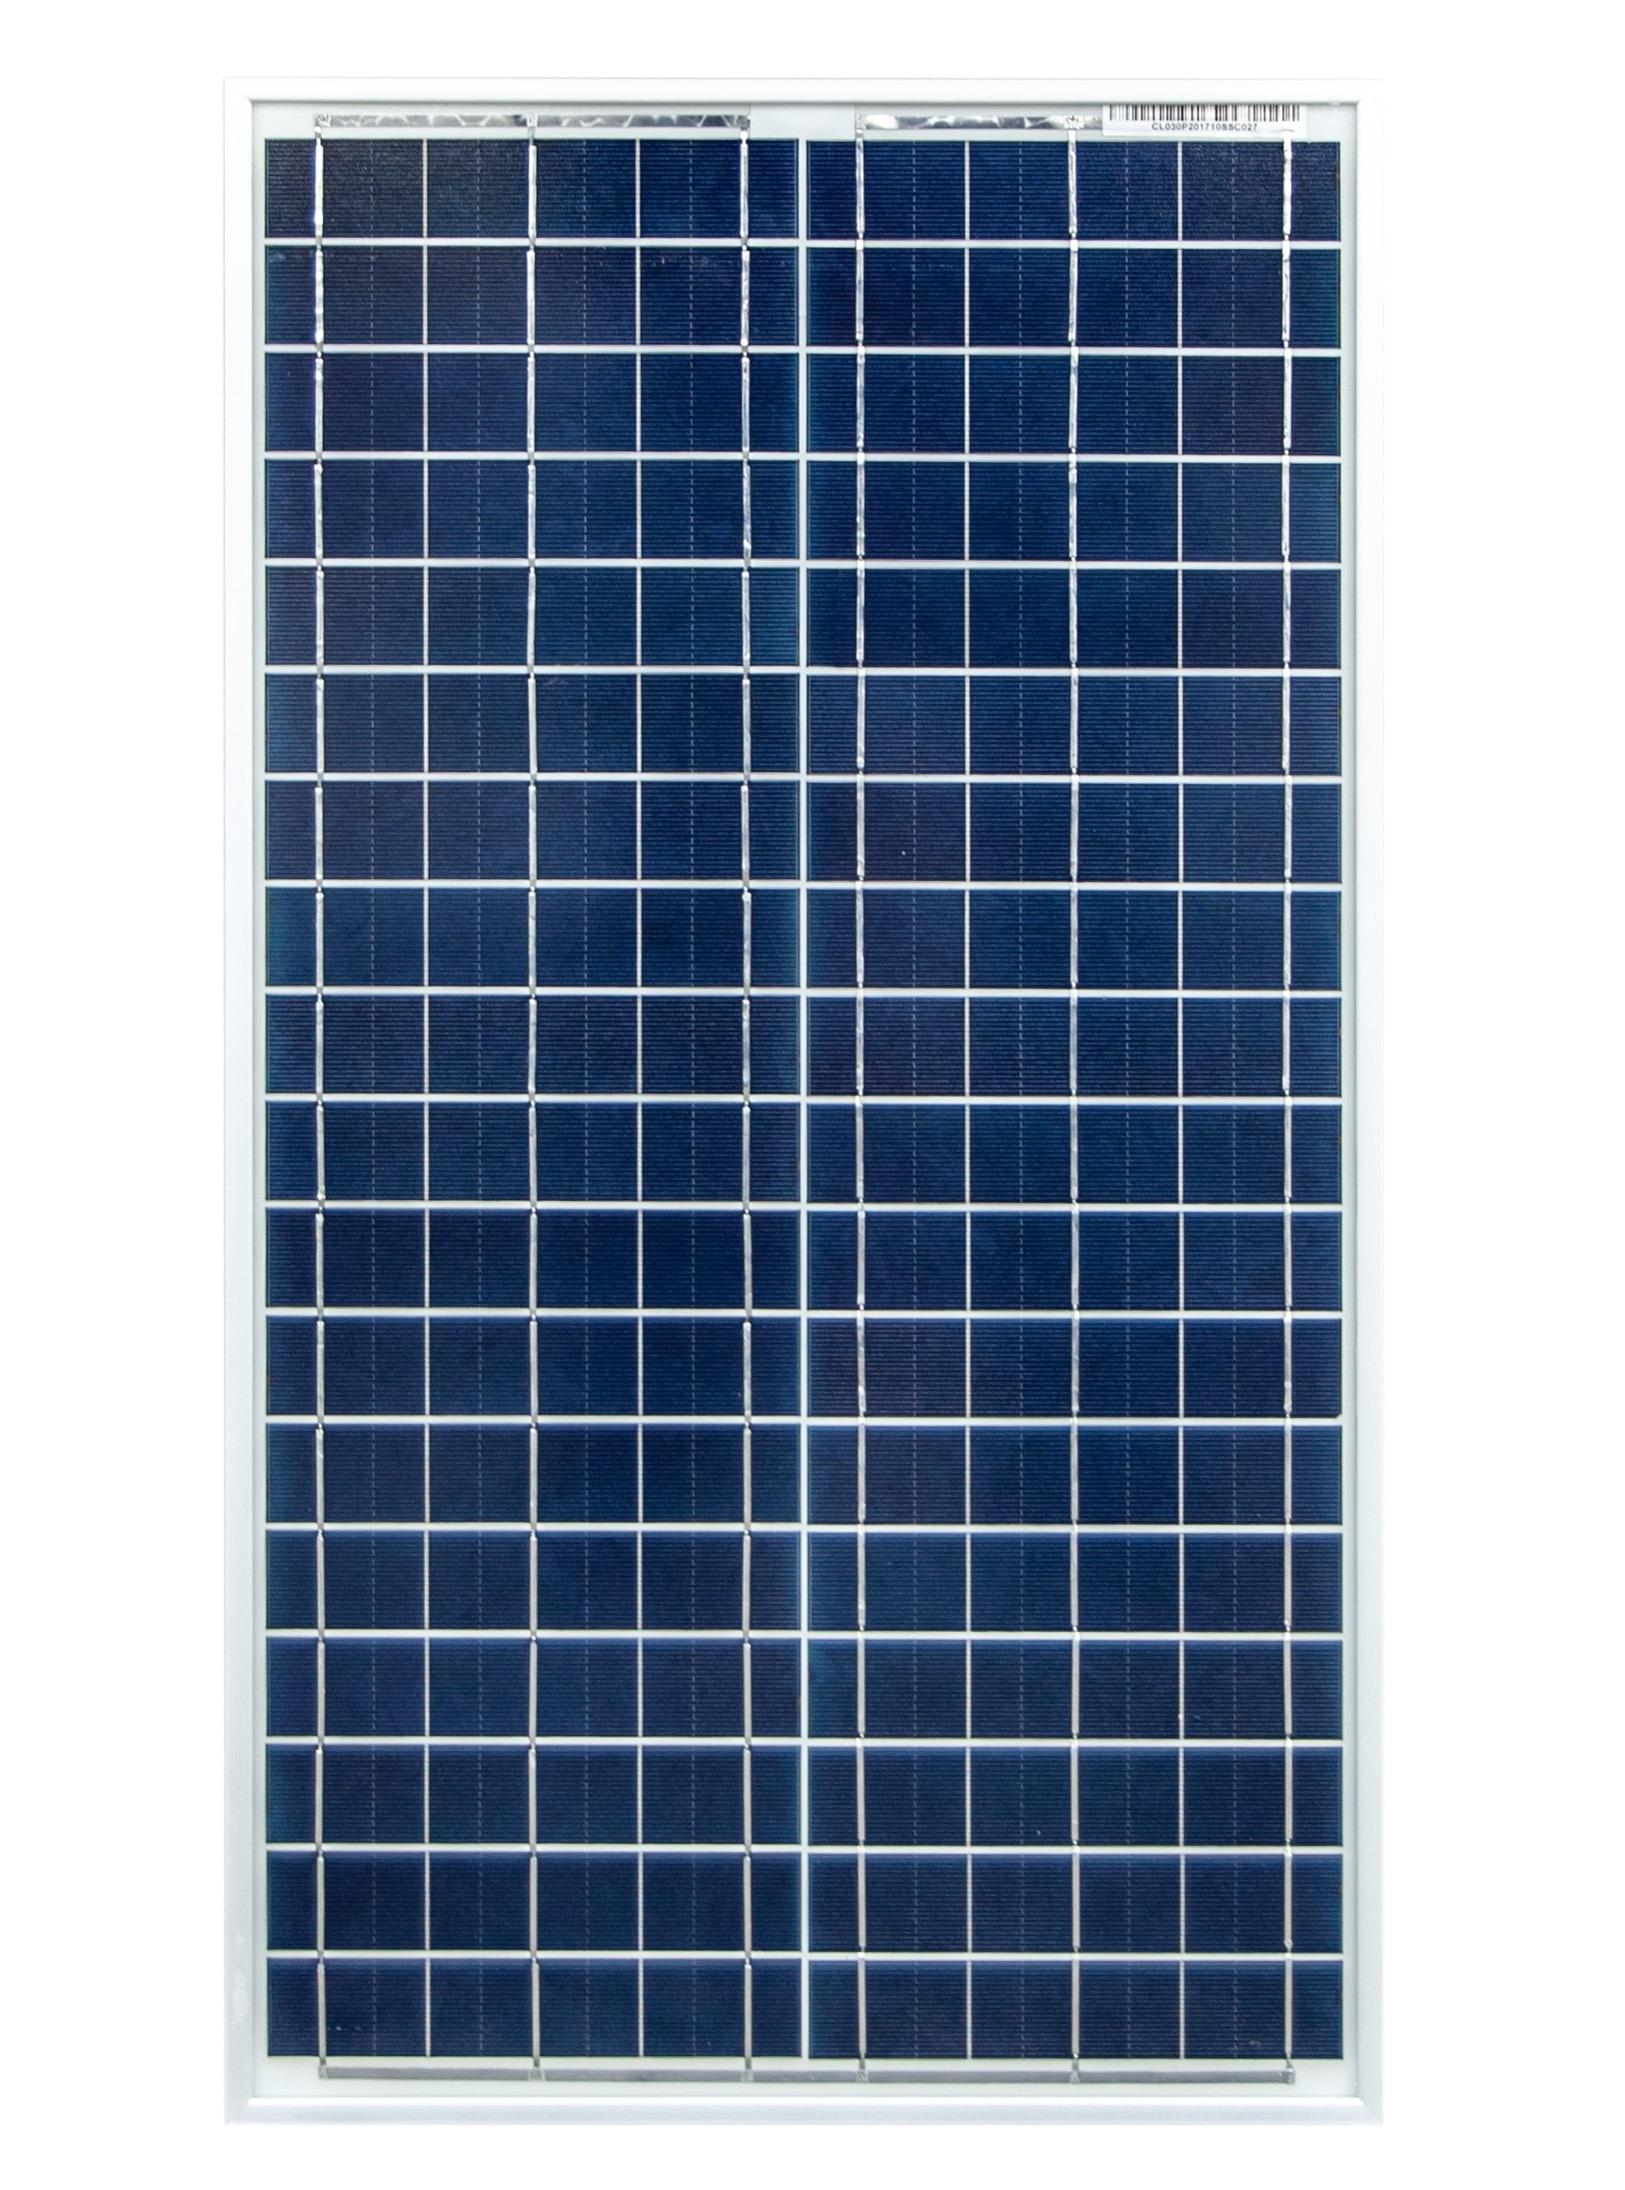 Image of Panel solarny słoneczny o mocy 30w 12v celline cl030-12p